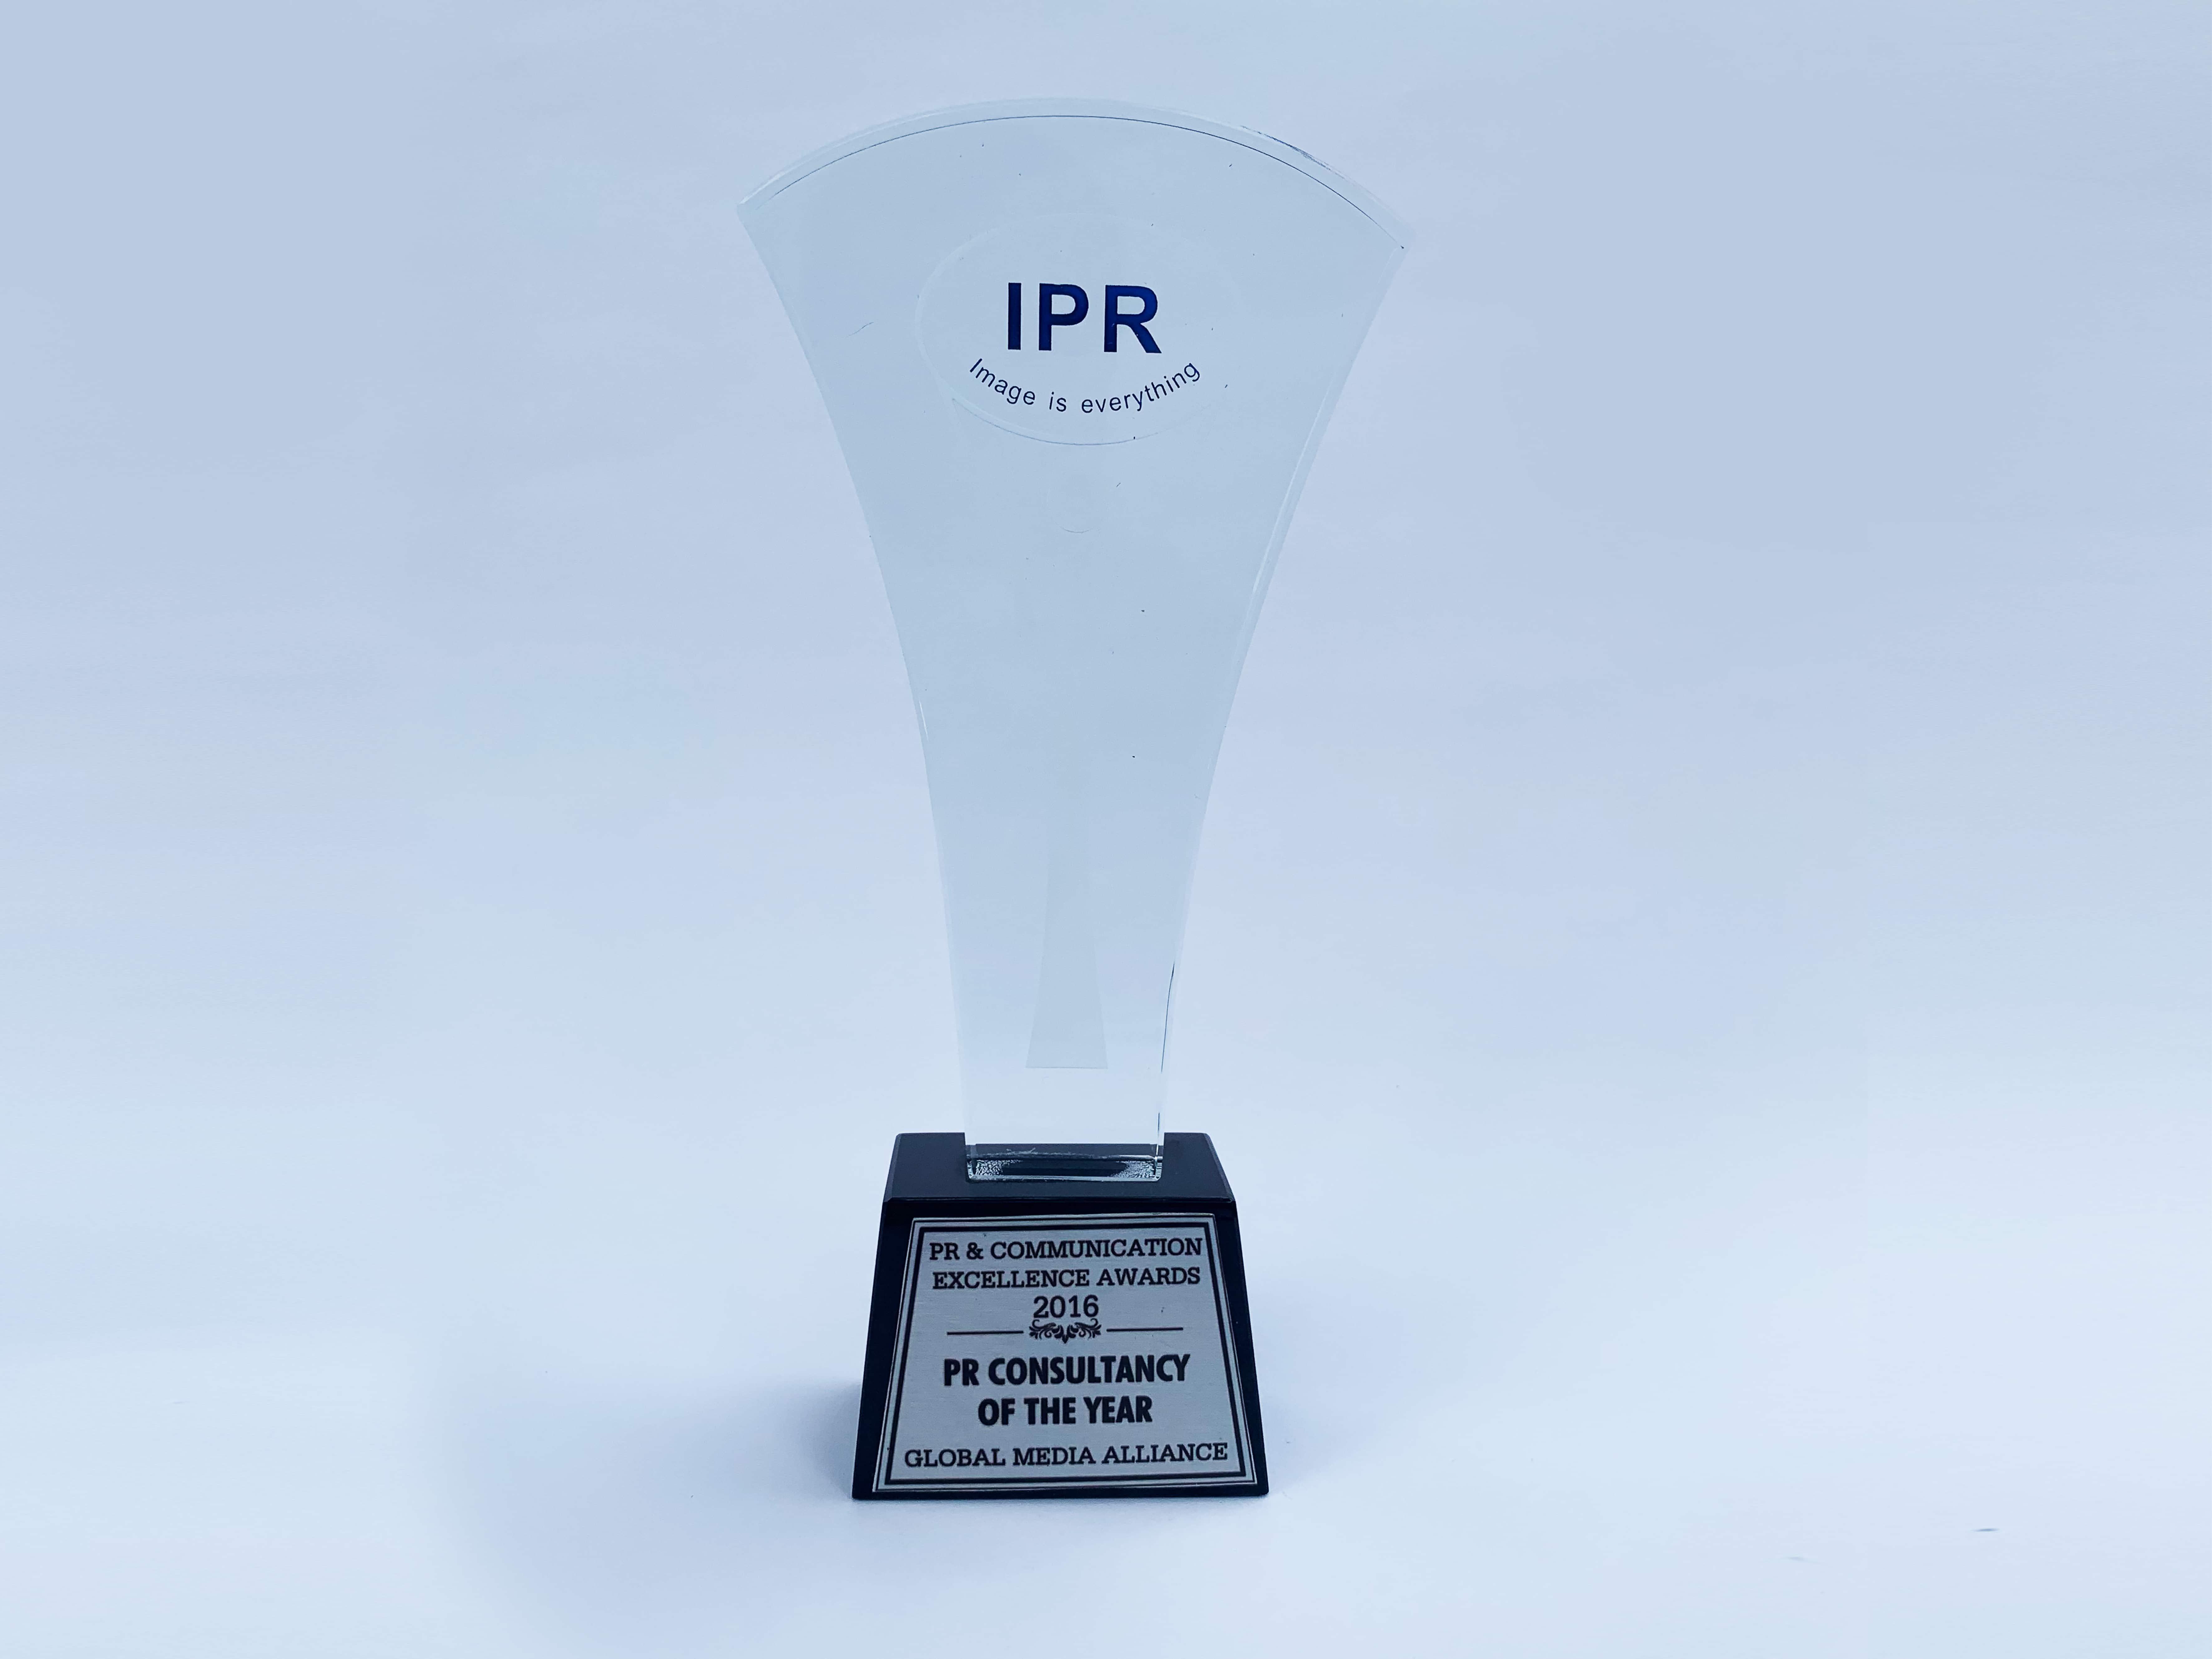 IPR-Awards 2016